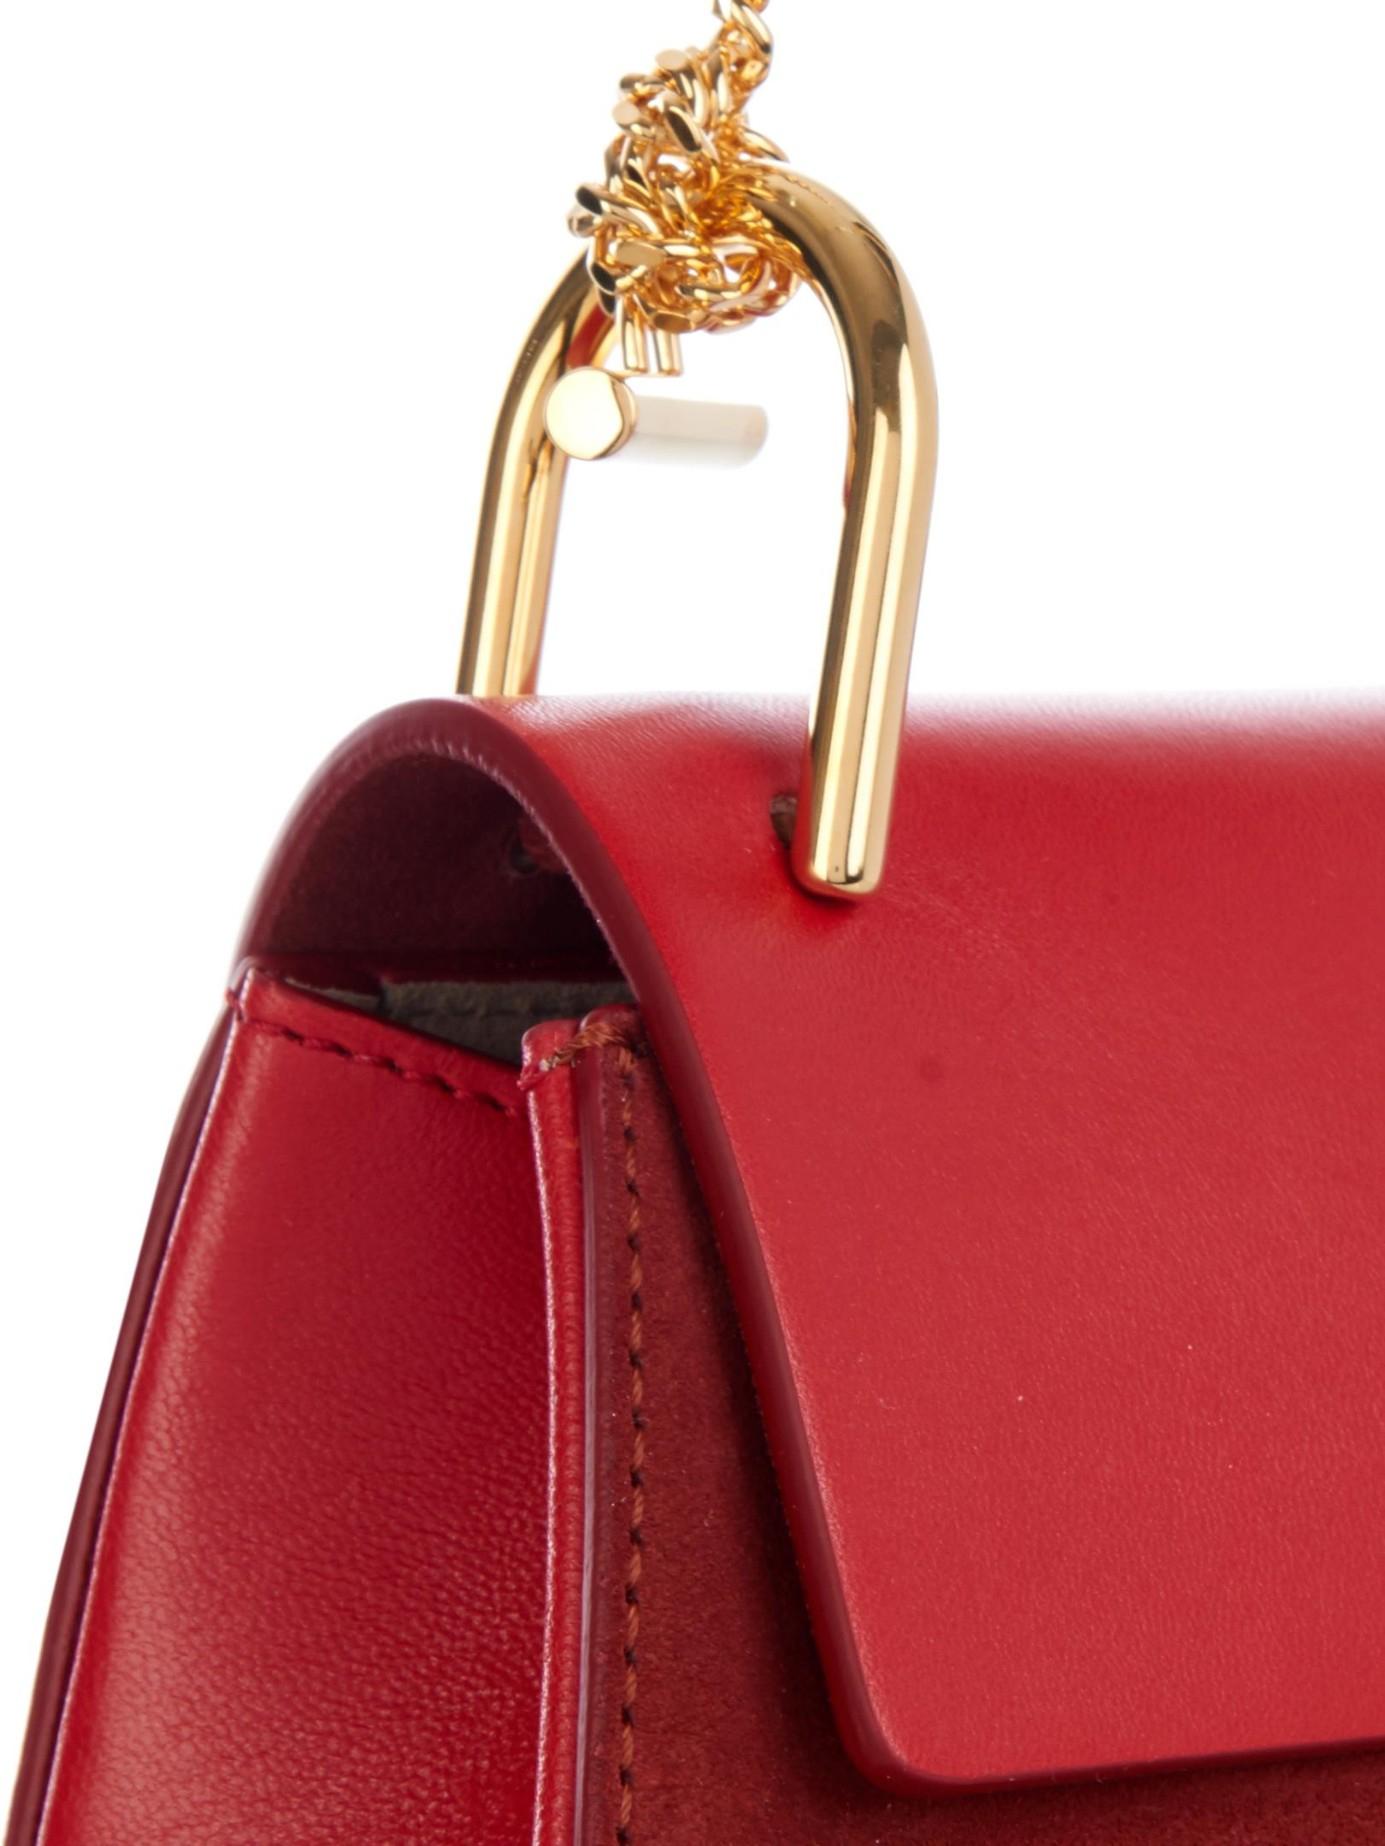 chlo bags - Chlo�� Drew Cross-Body Bag in Red | Lyst